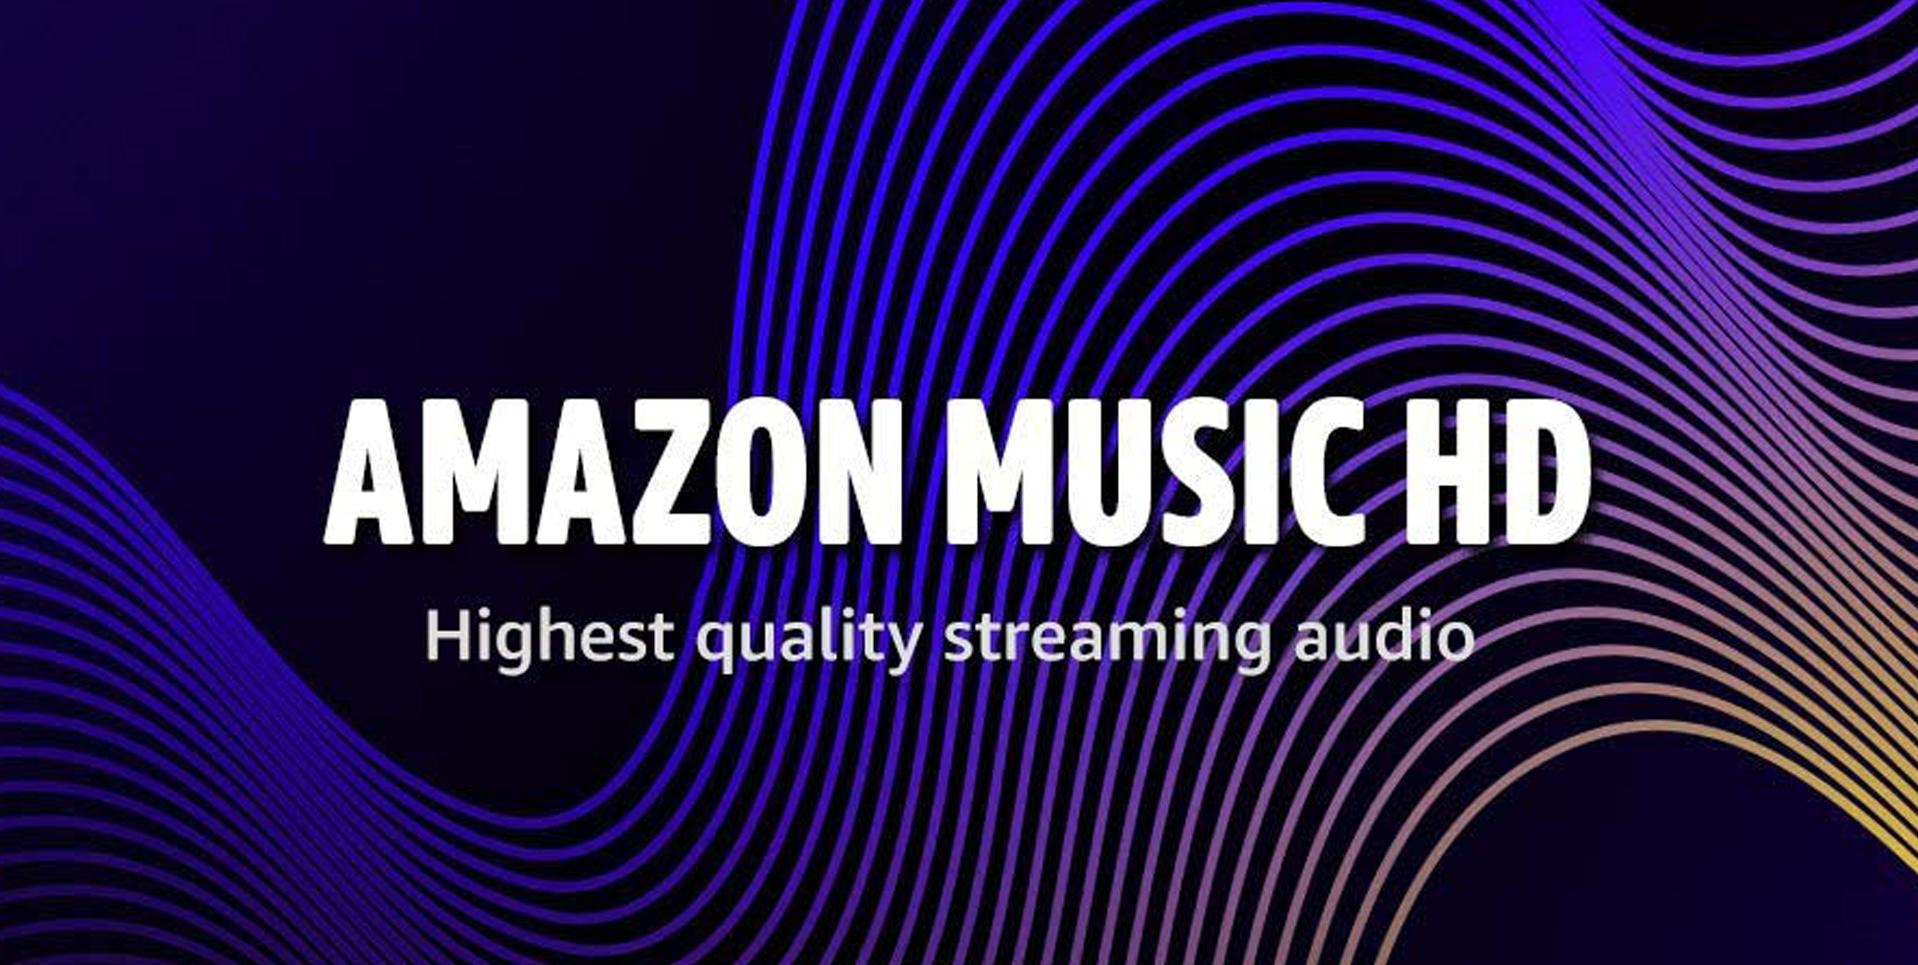 amazon music hd free trial